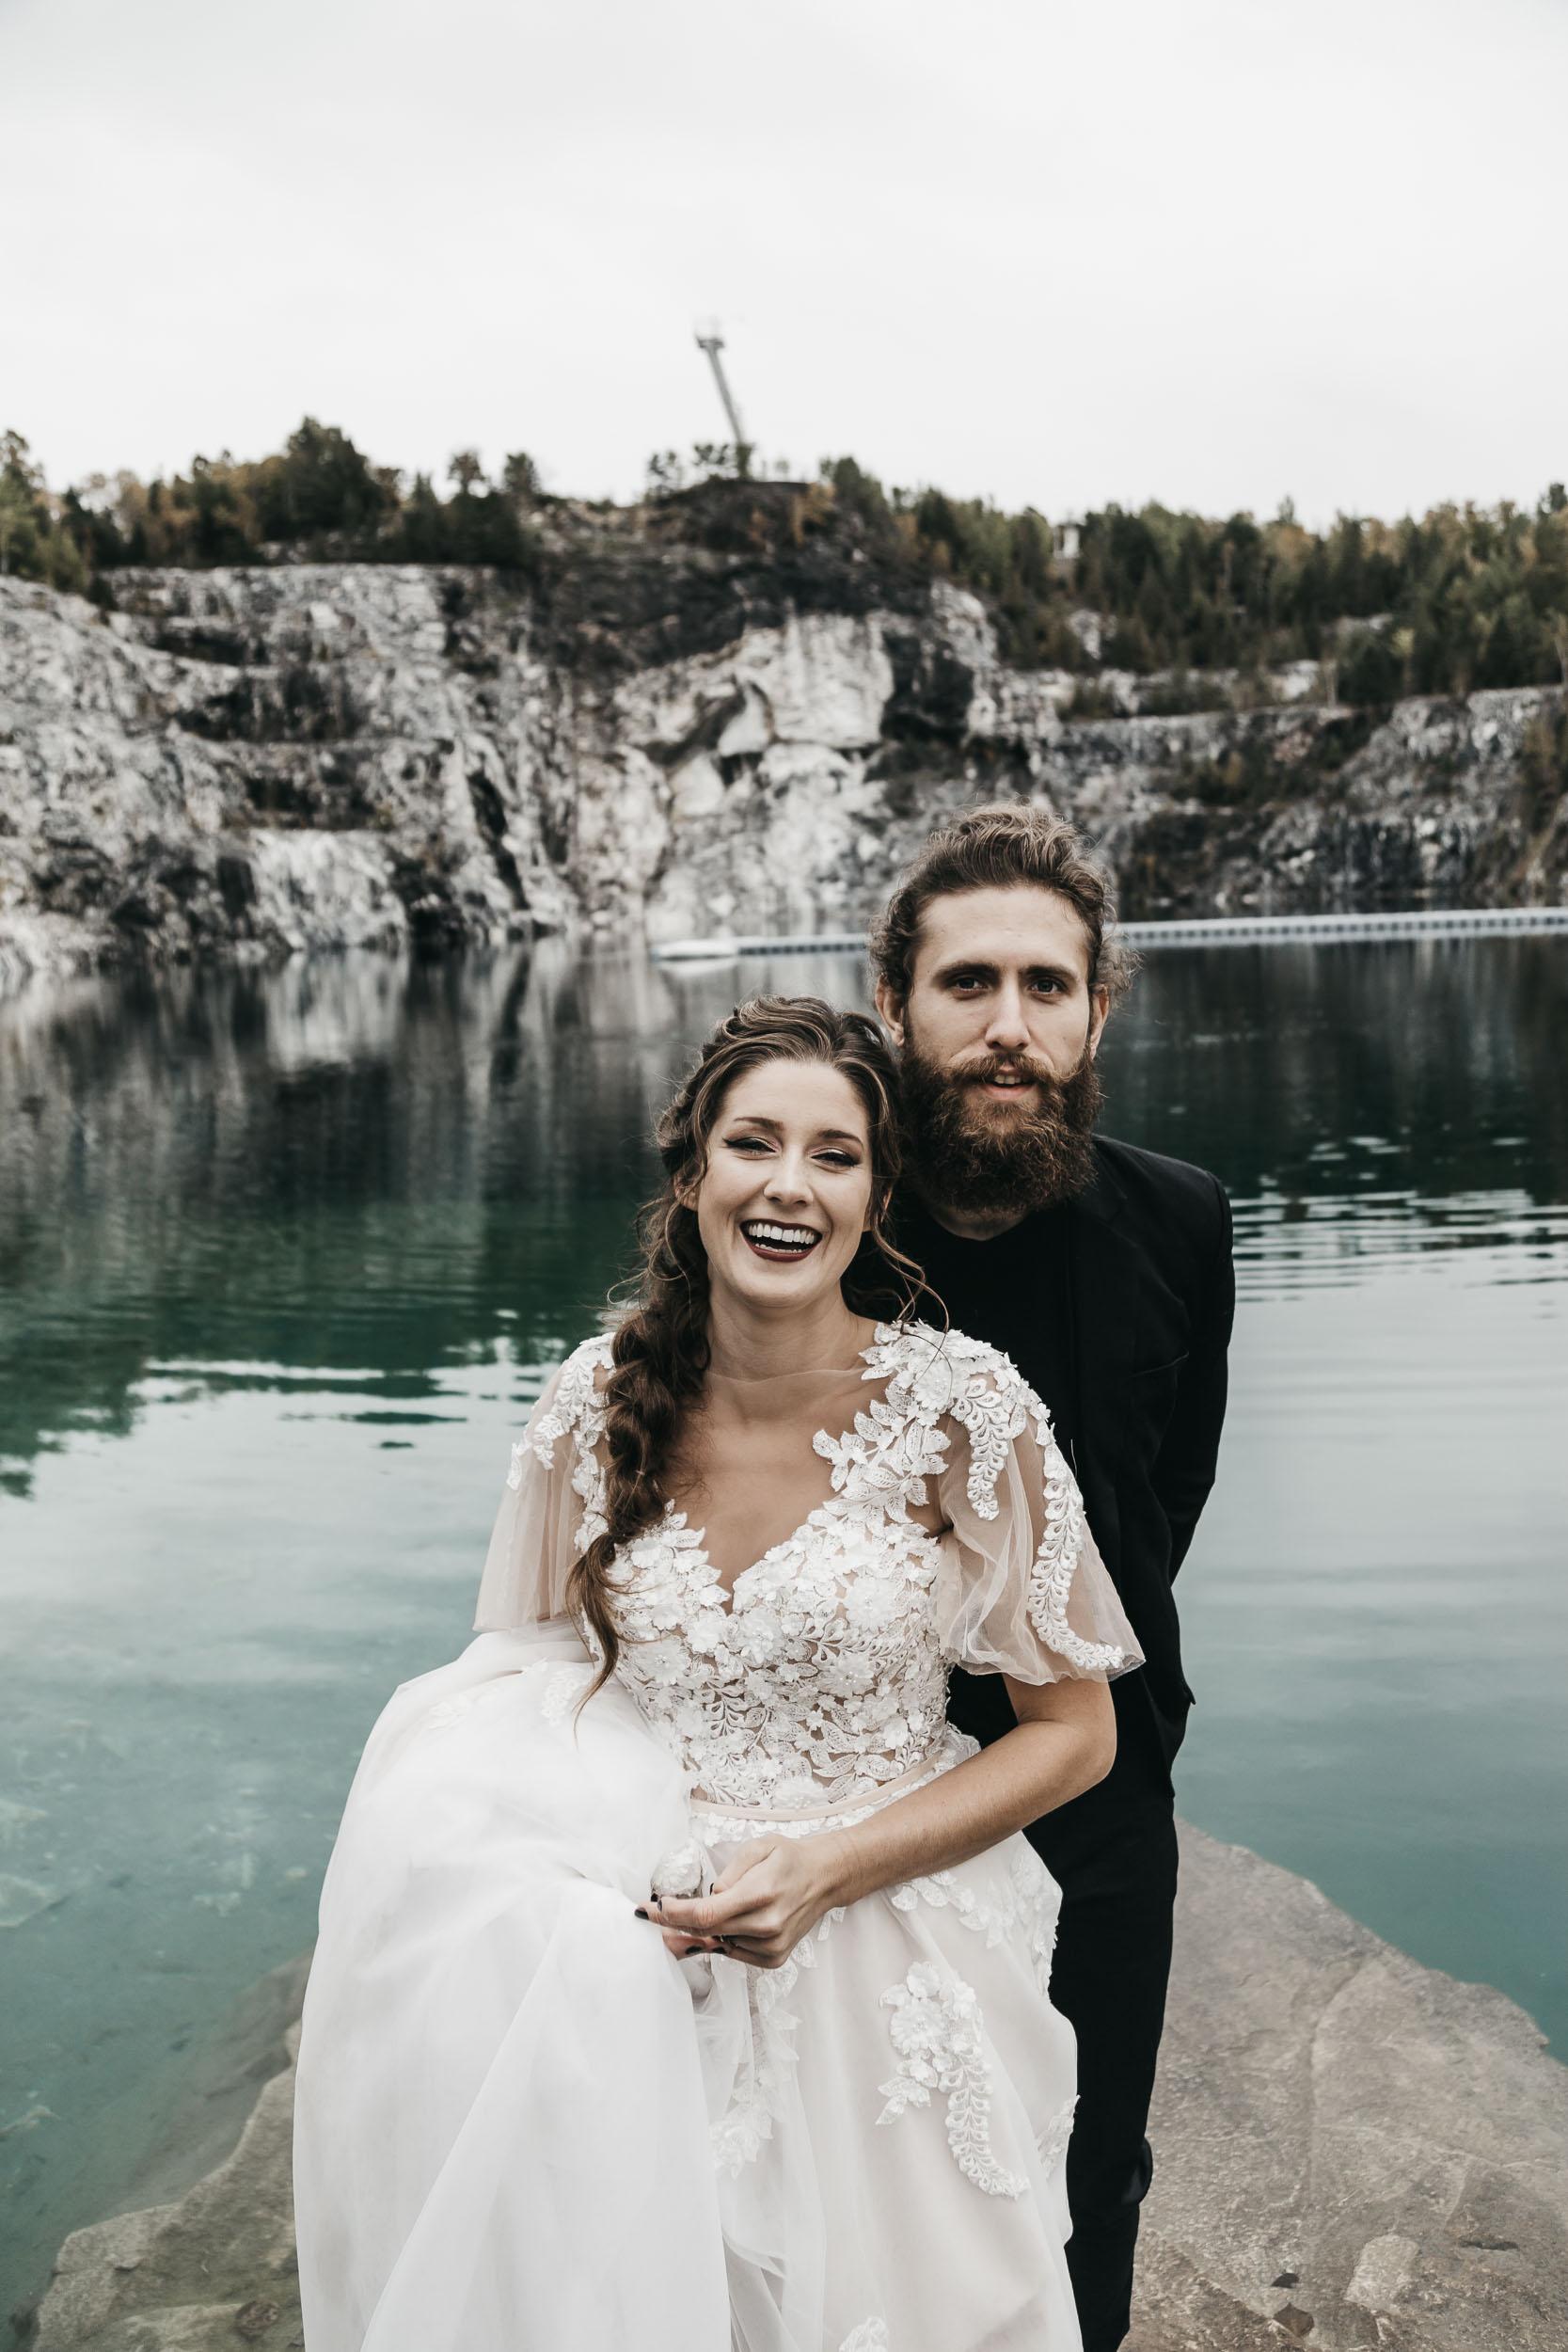 intimate-wedding-elopement-photographer-ottawa-toronto-0411.jpg